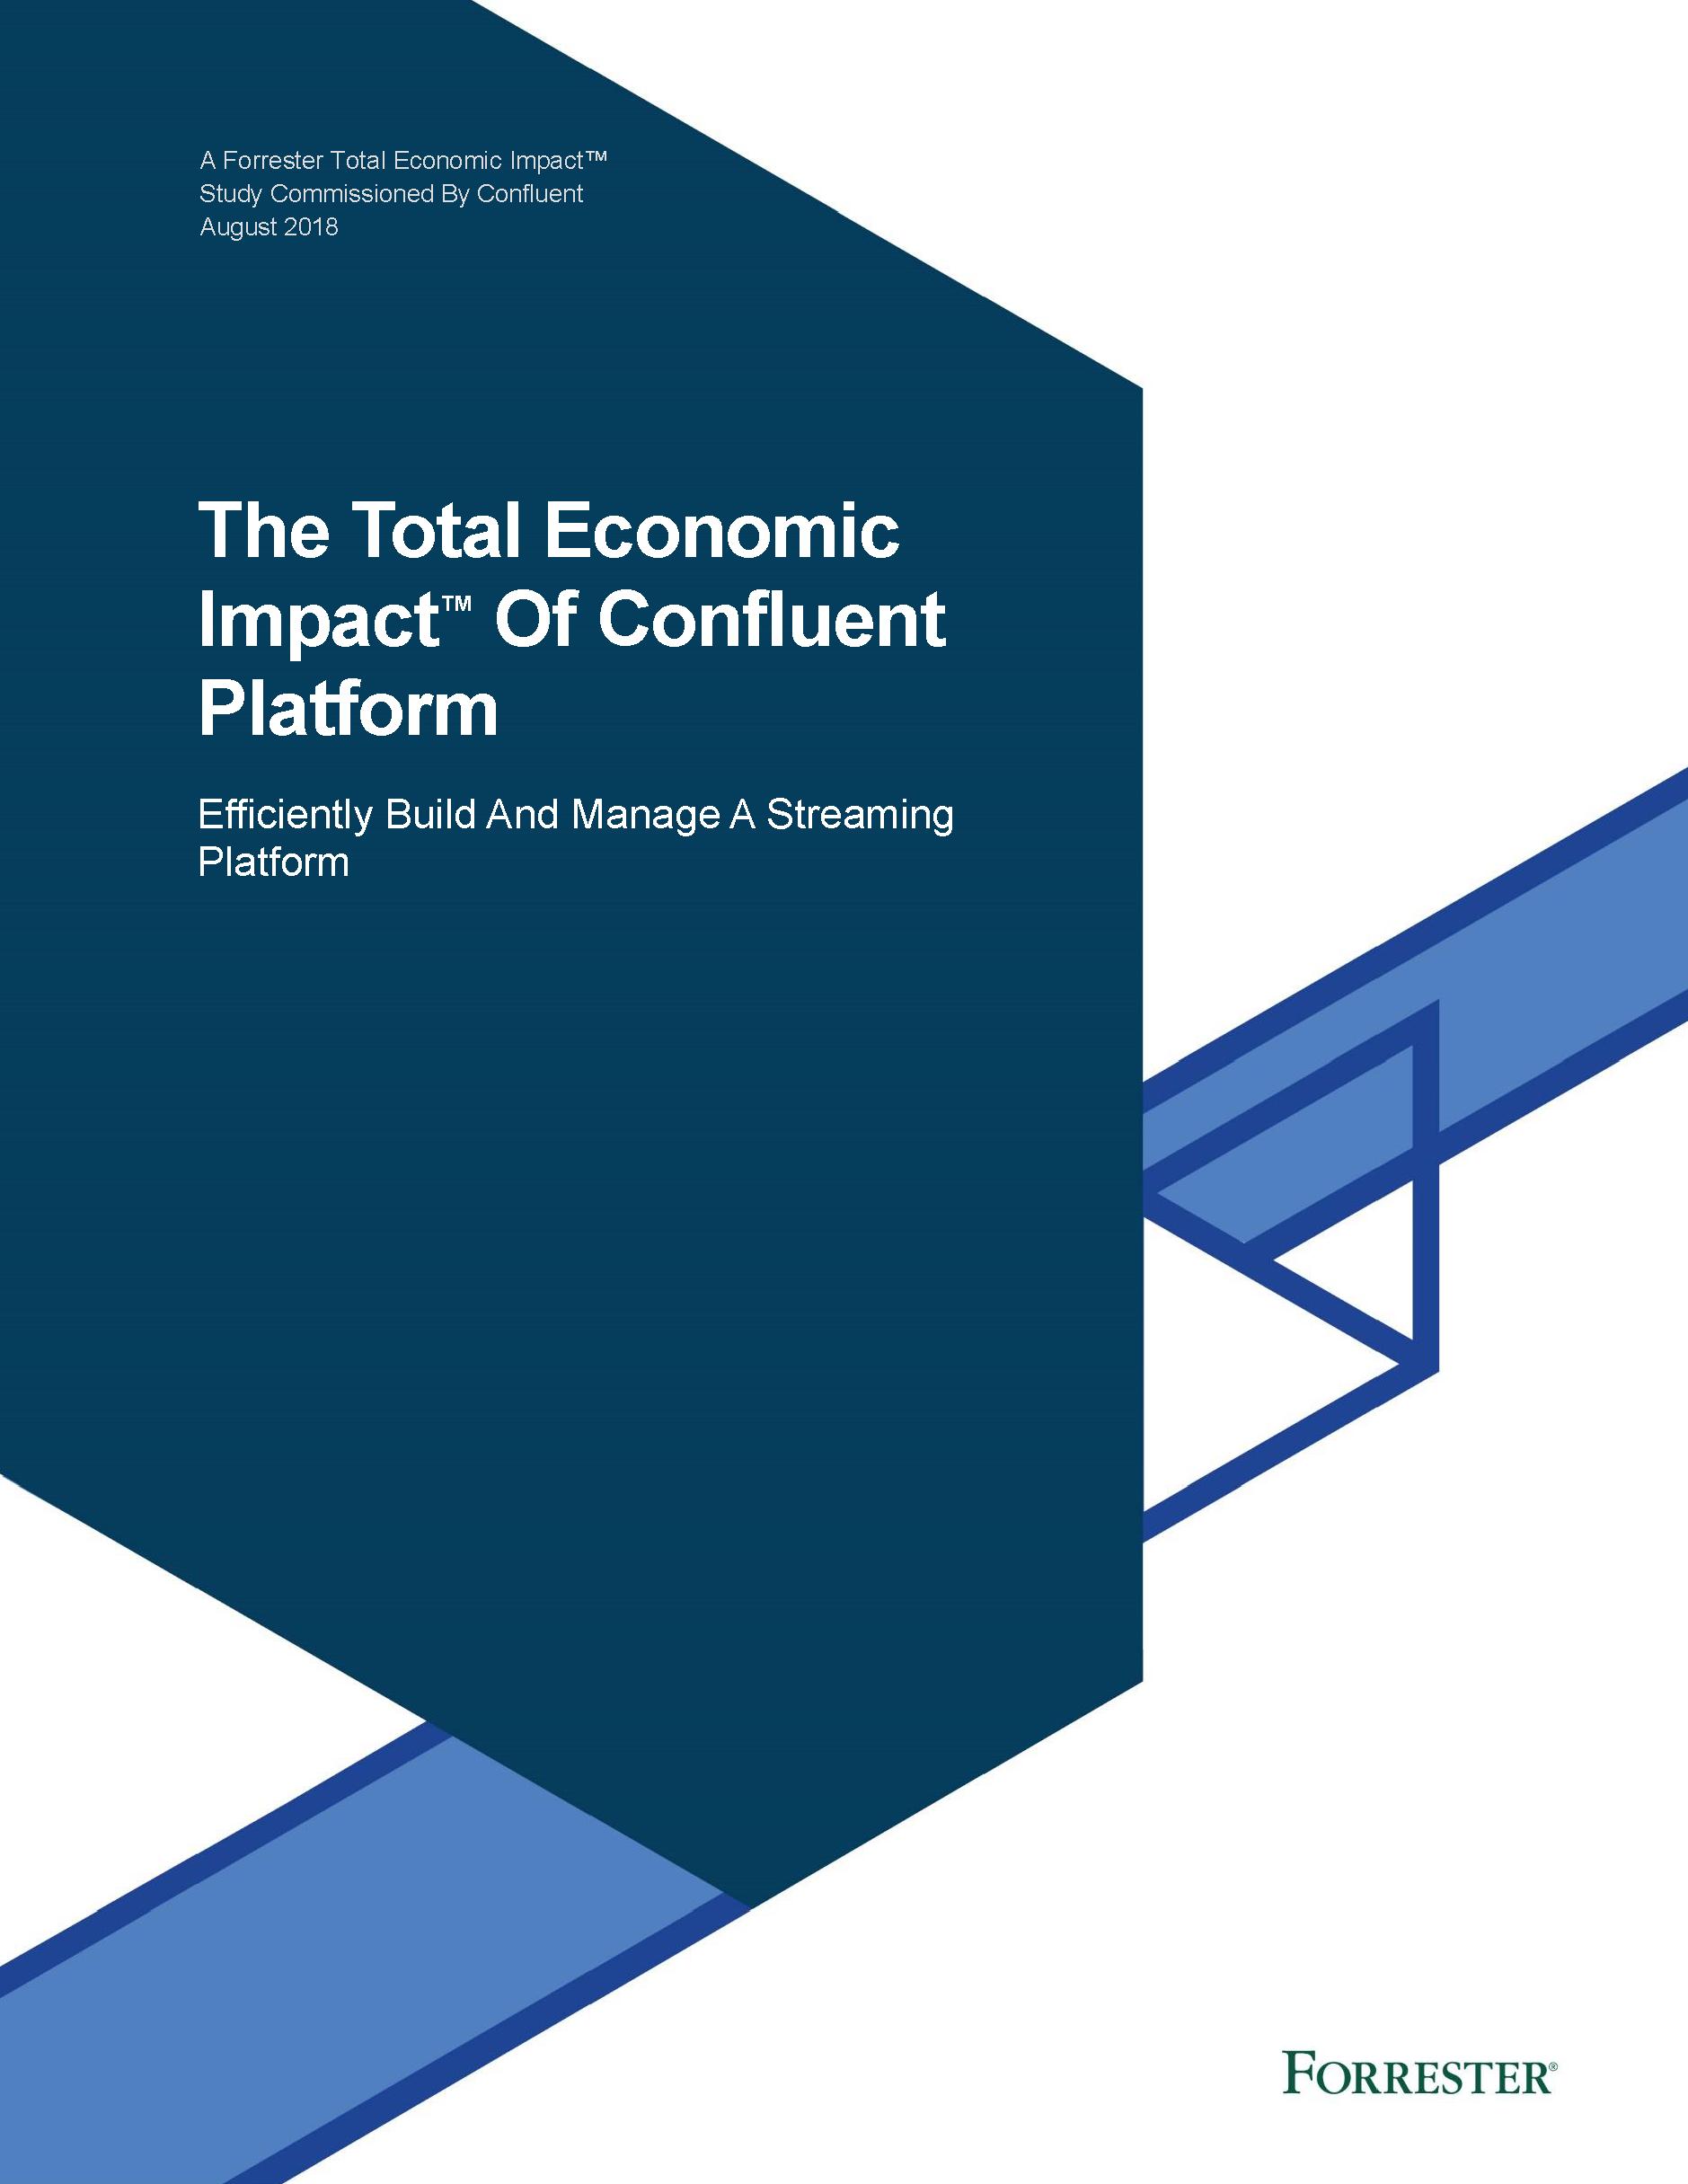 The Total Economic Impact of Confluent Platform